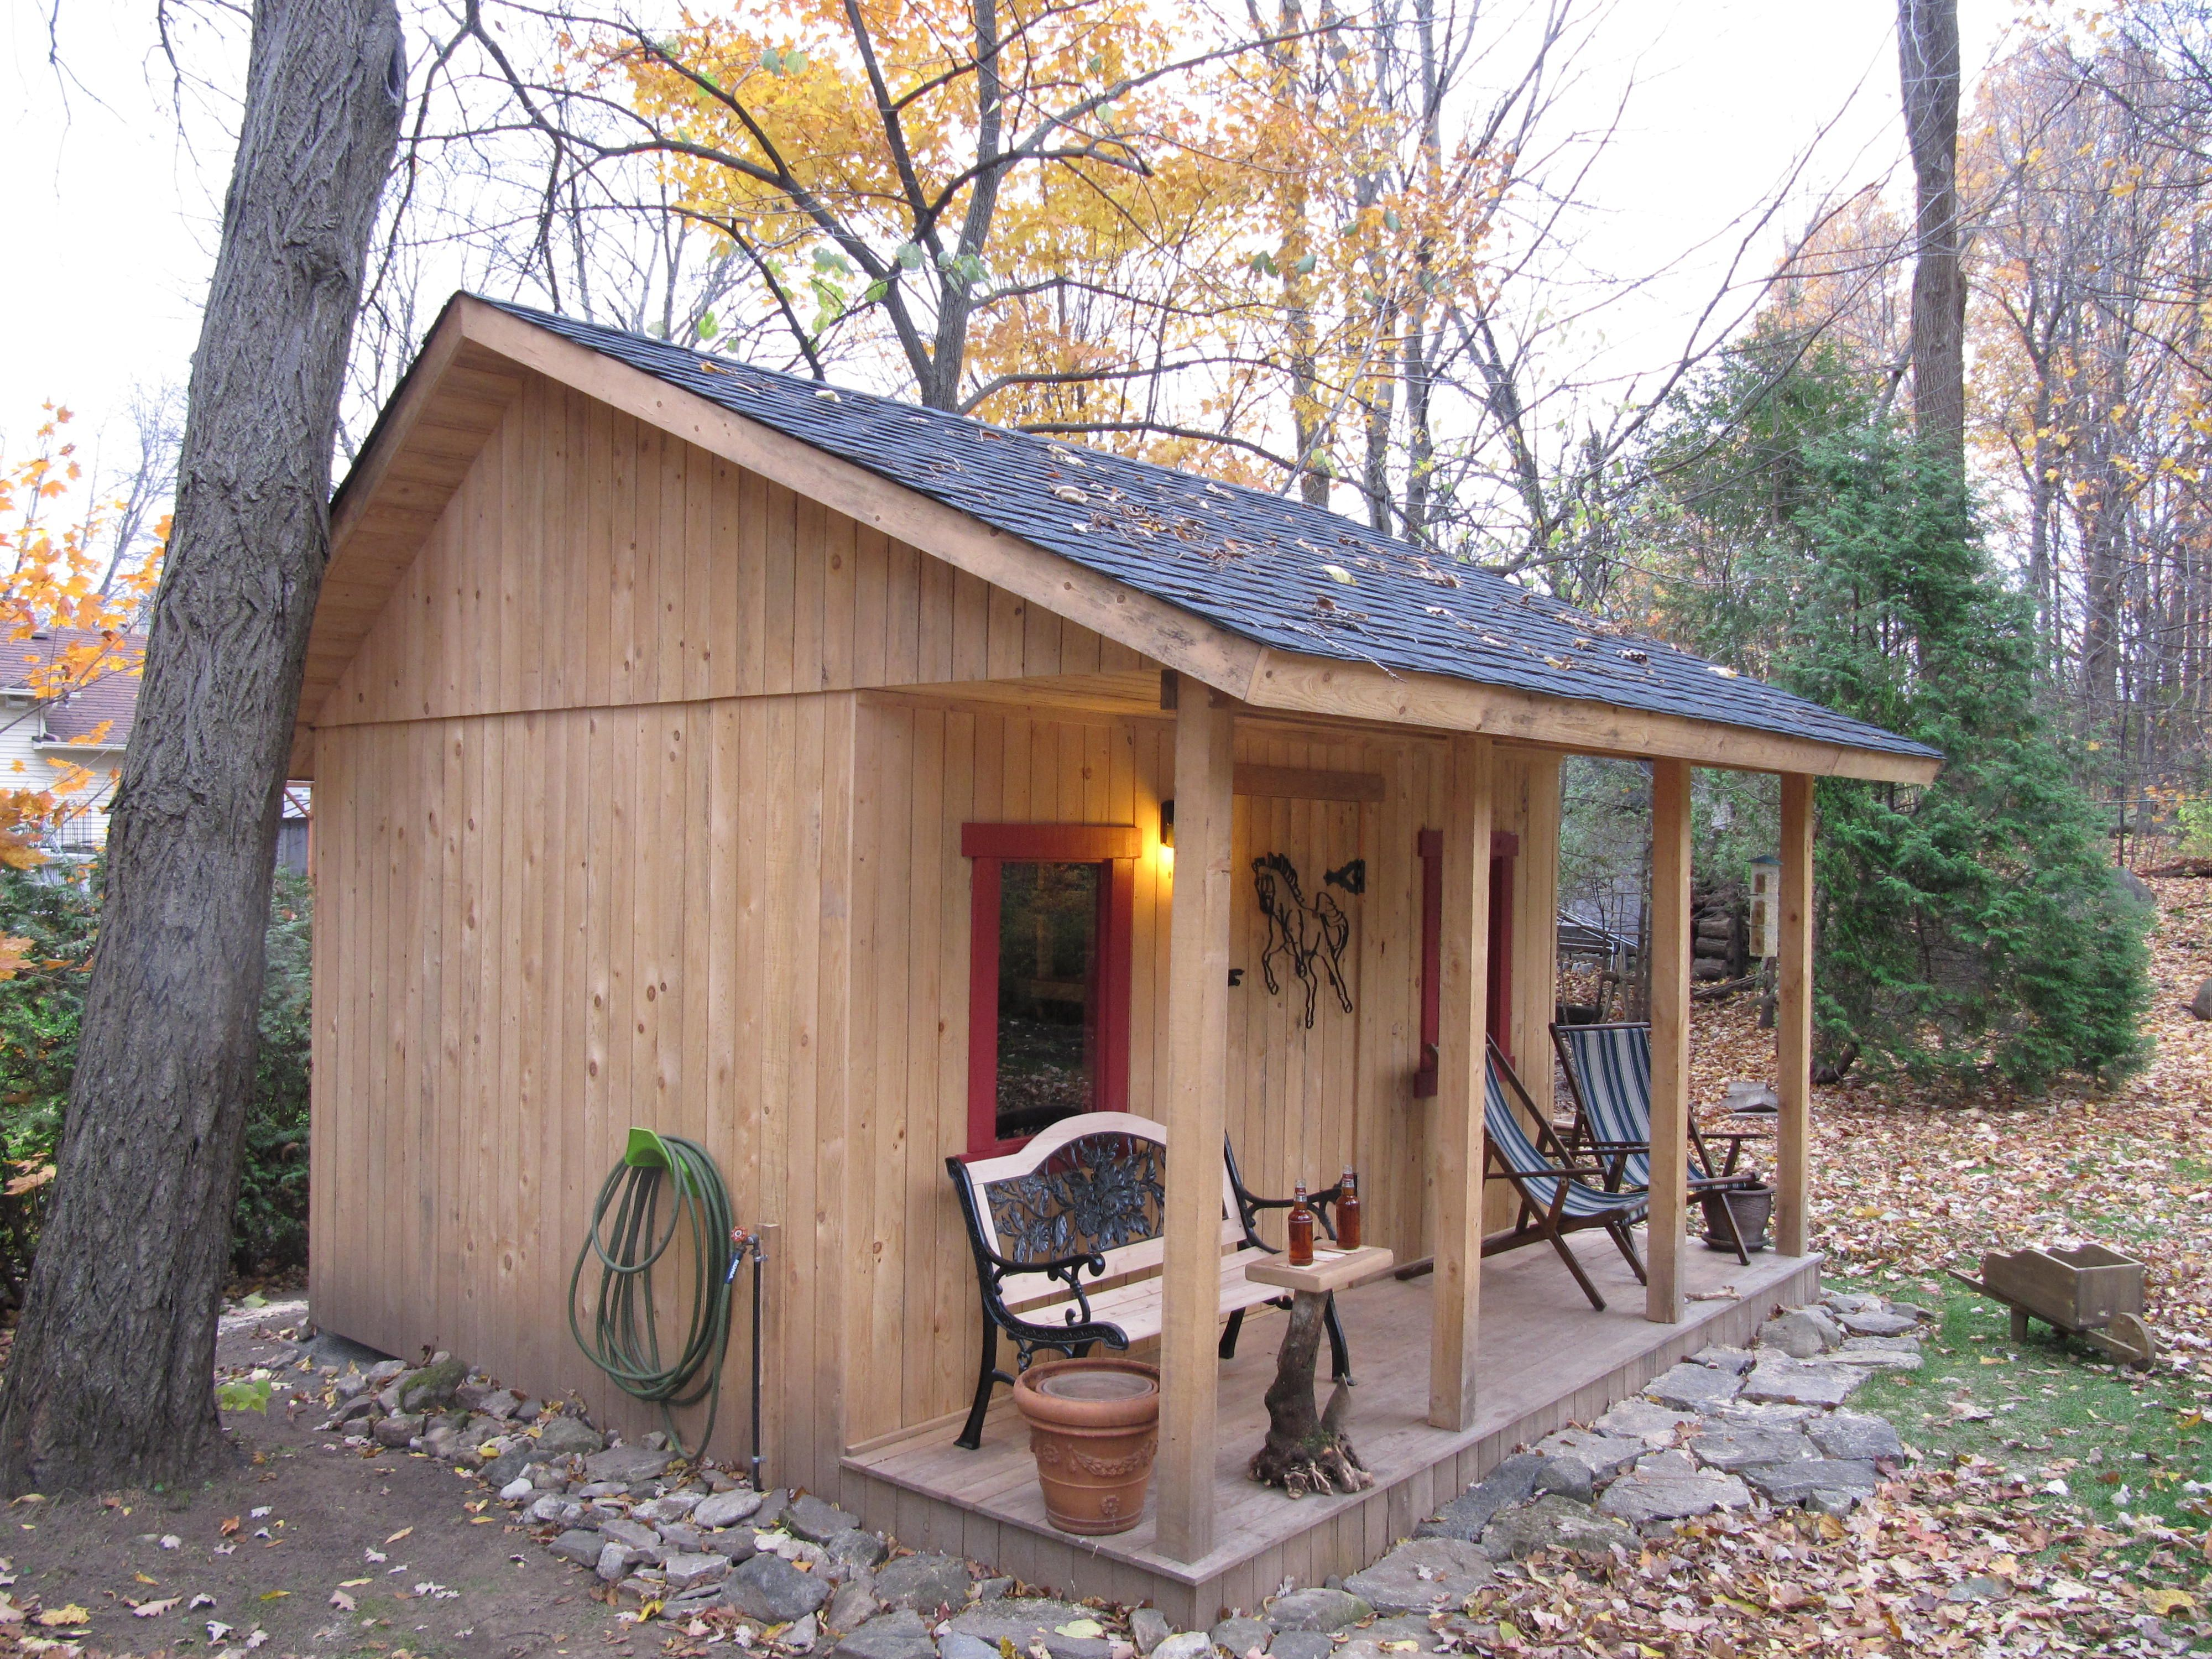 Notre cabanon en pruche cabane jardin outdoor structures backyard et outdoor - Baraque de jardin ...